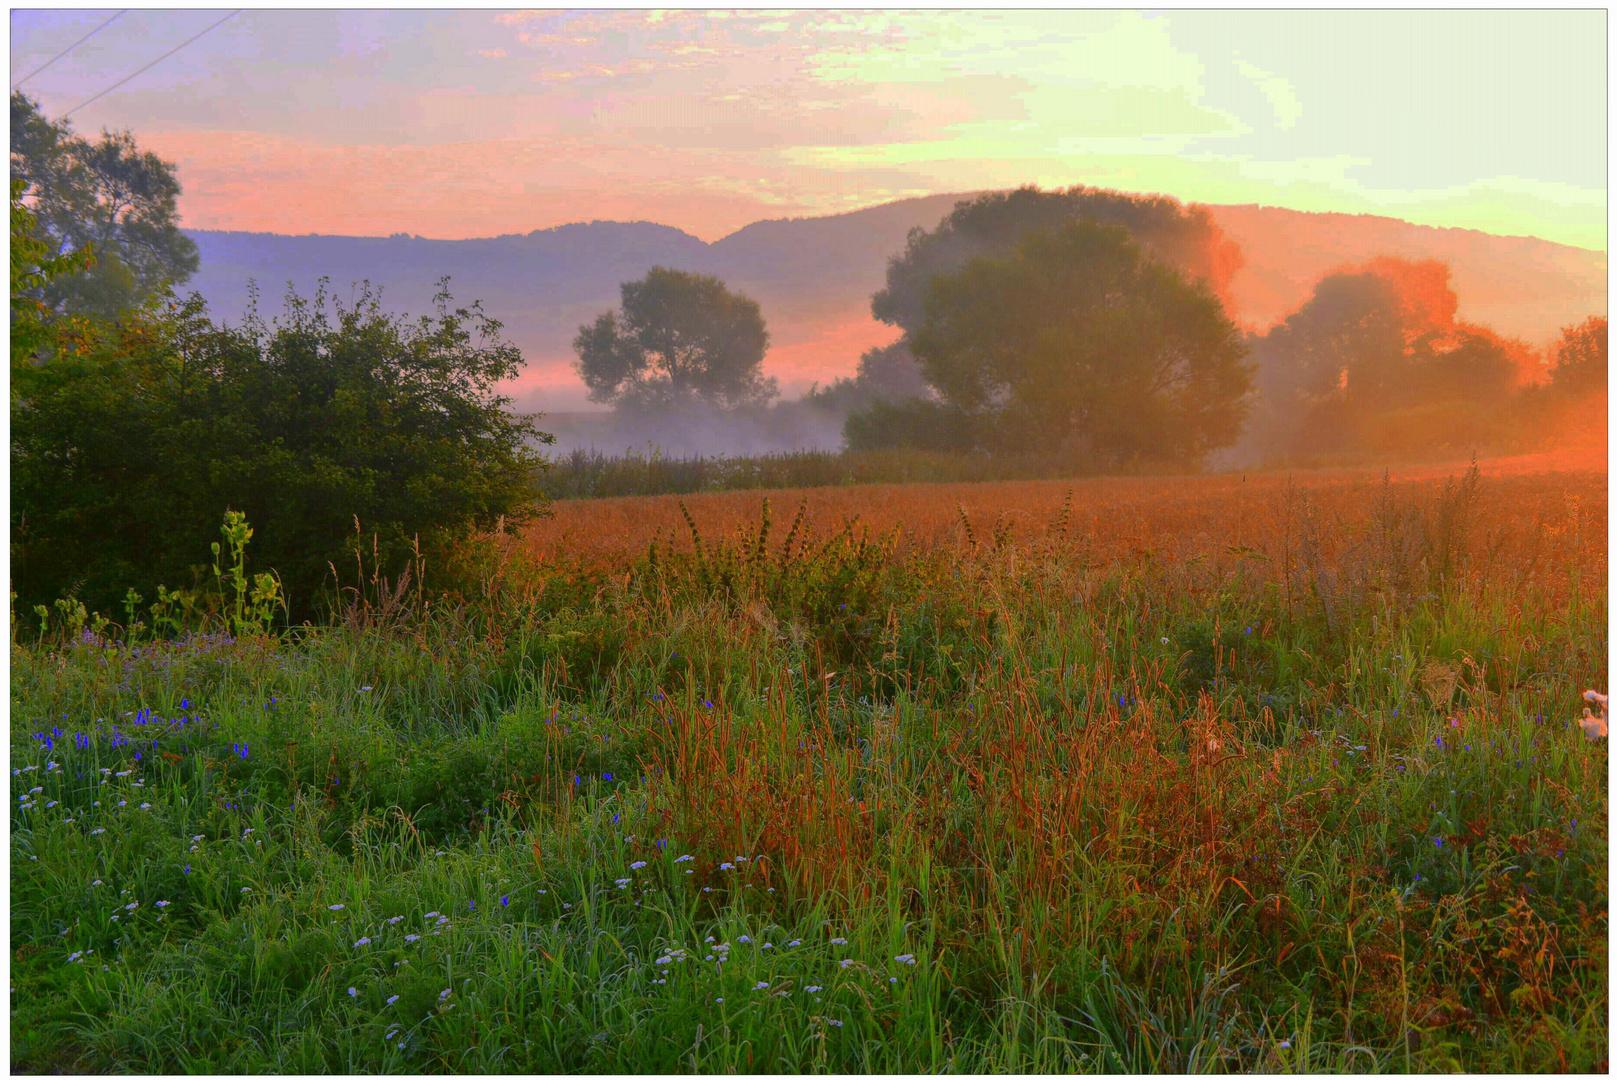 Hora matutina en el lago II (Morgenstunde am See II)